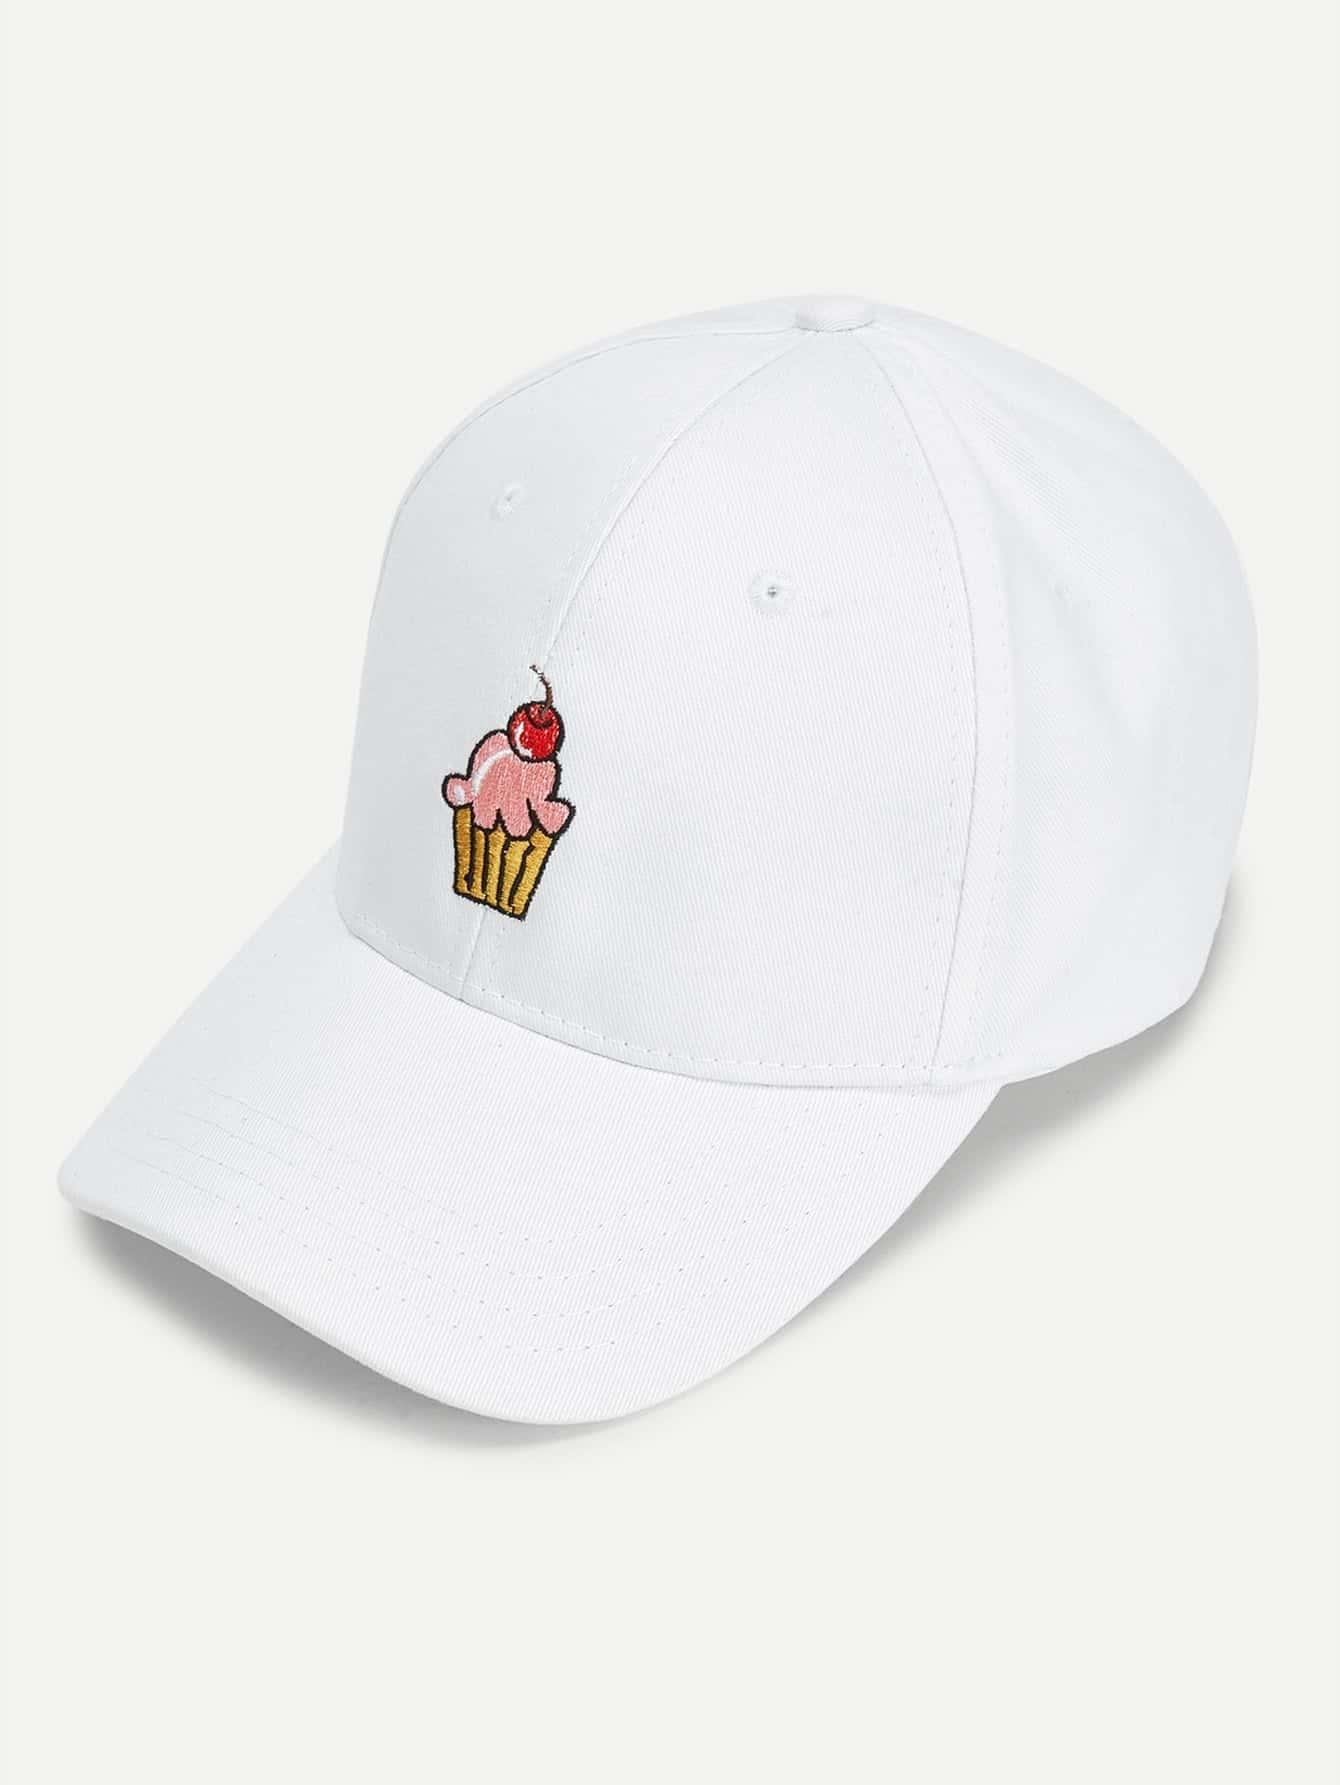 Cute Ice cream Embroidered Baseball Cap